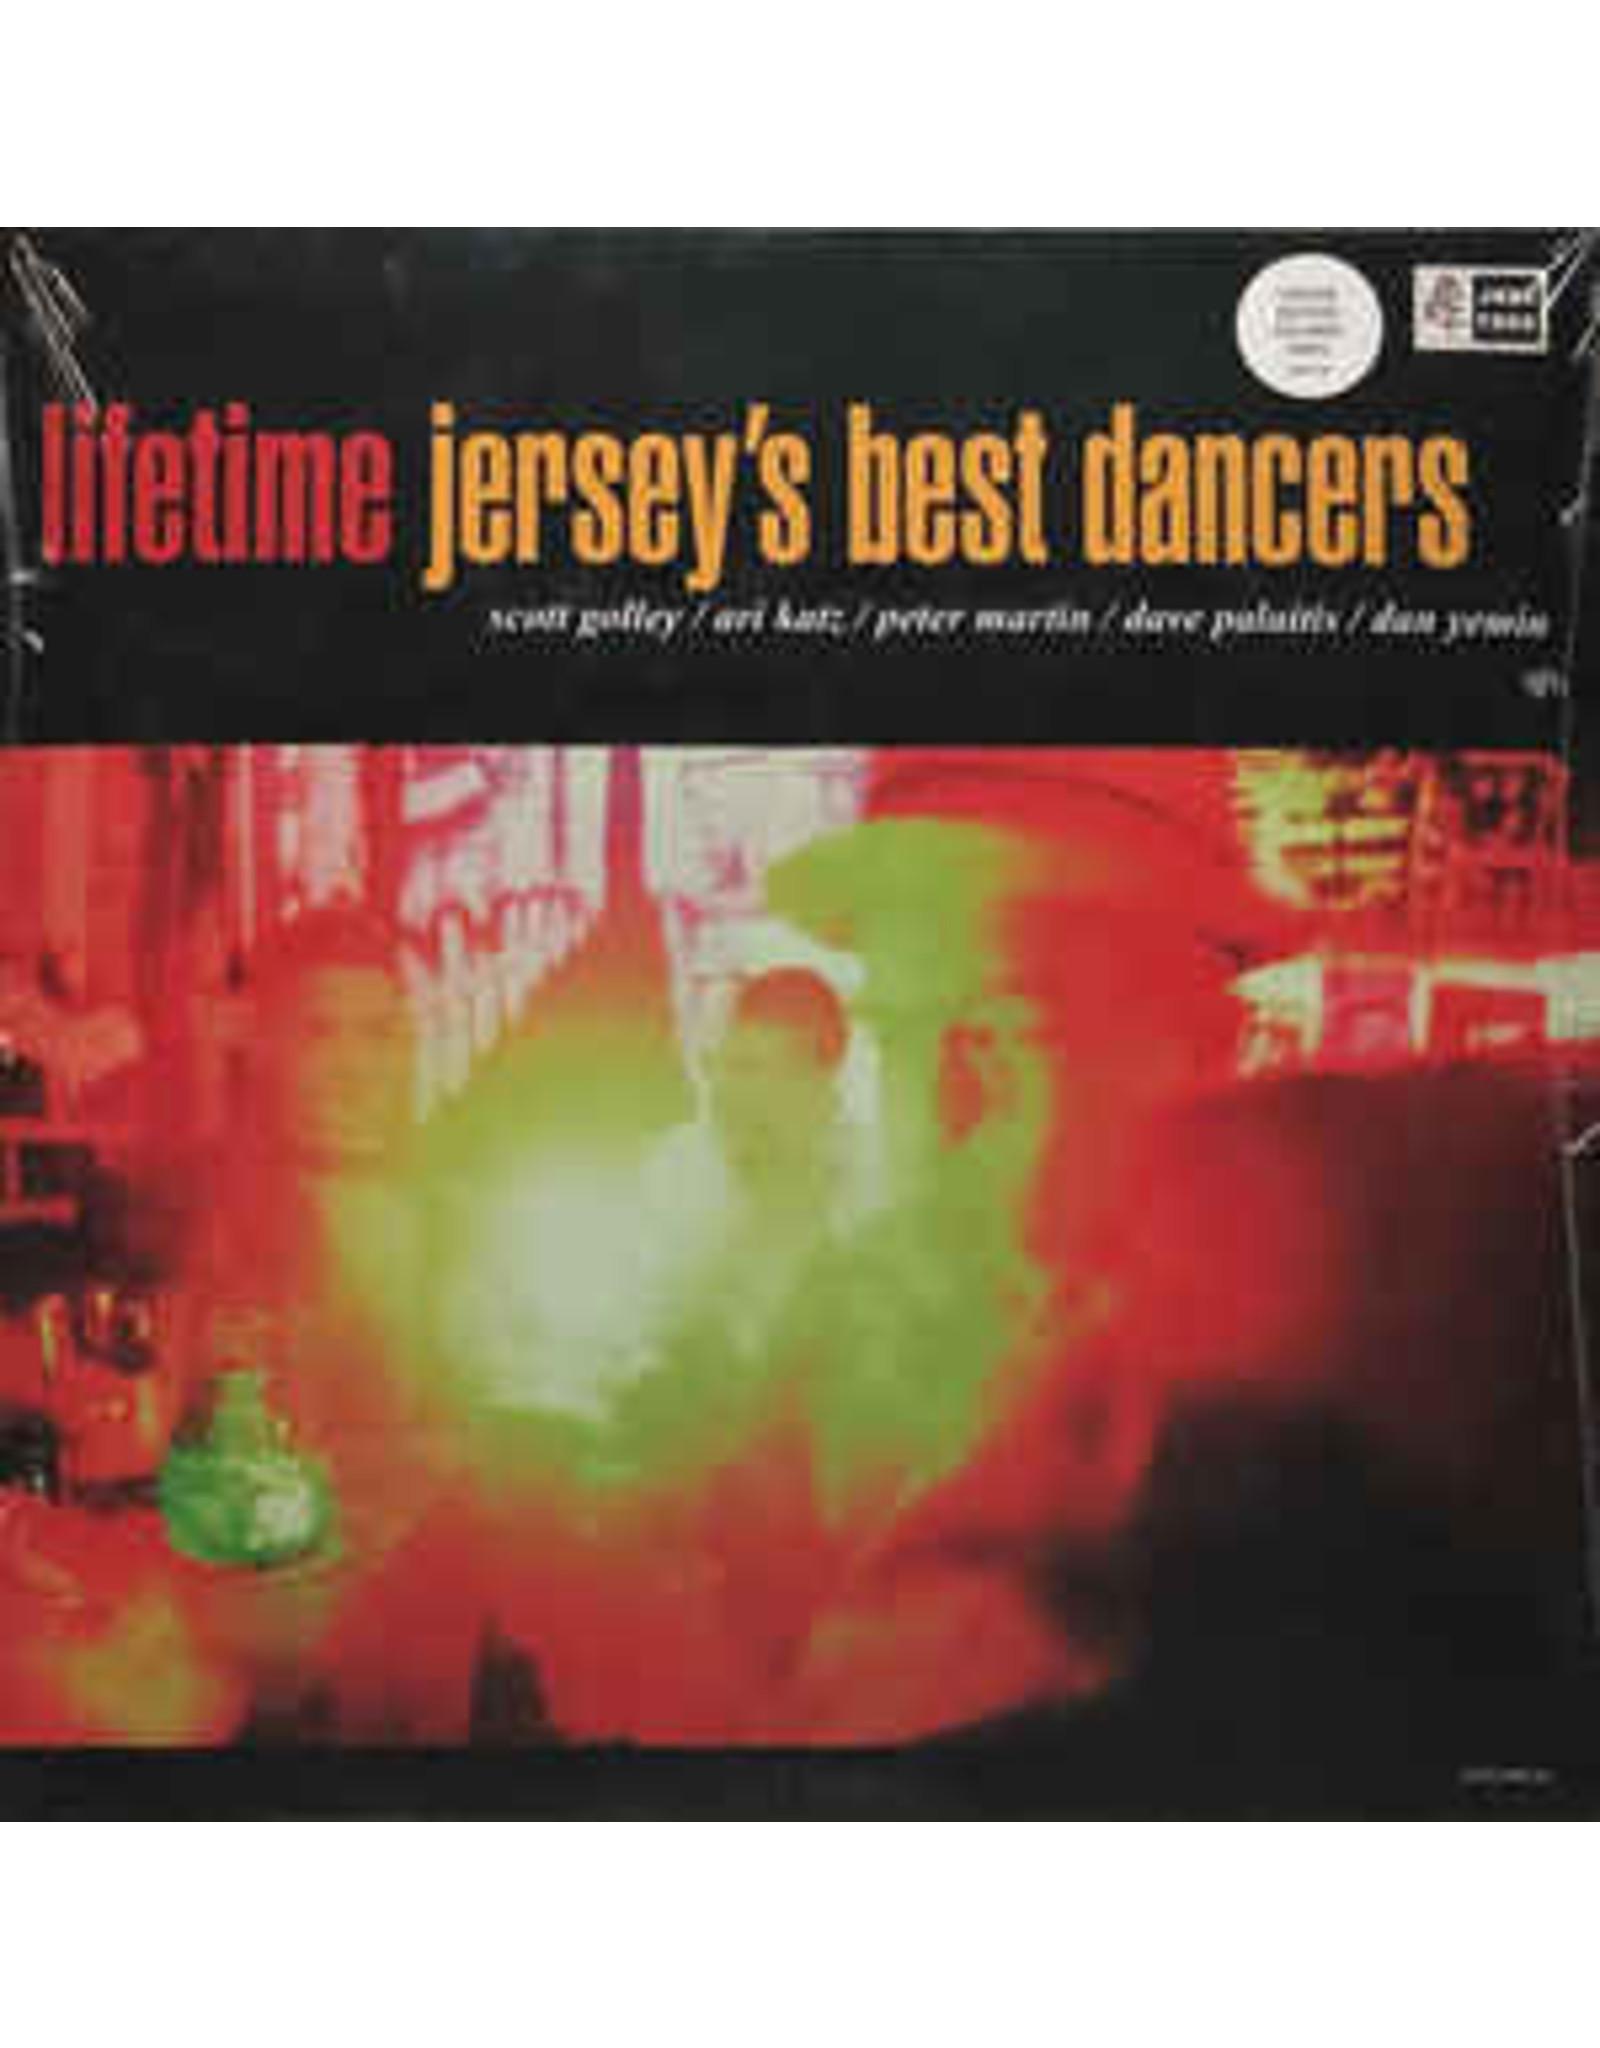 Lifetime - Jersey's Best Dancers LP